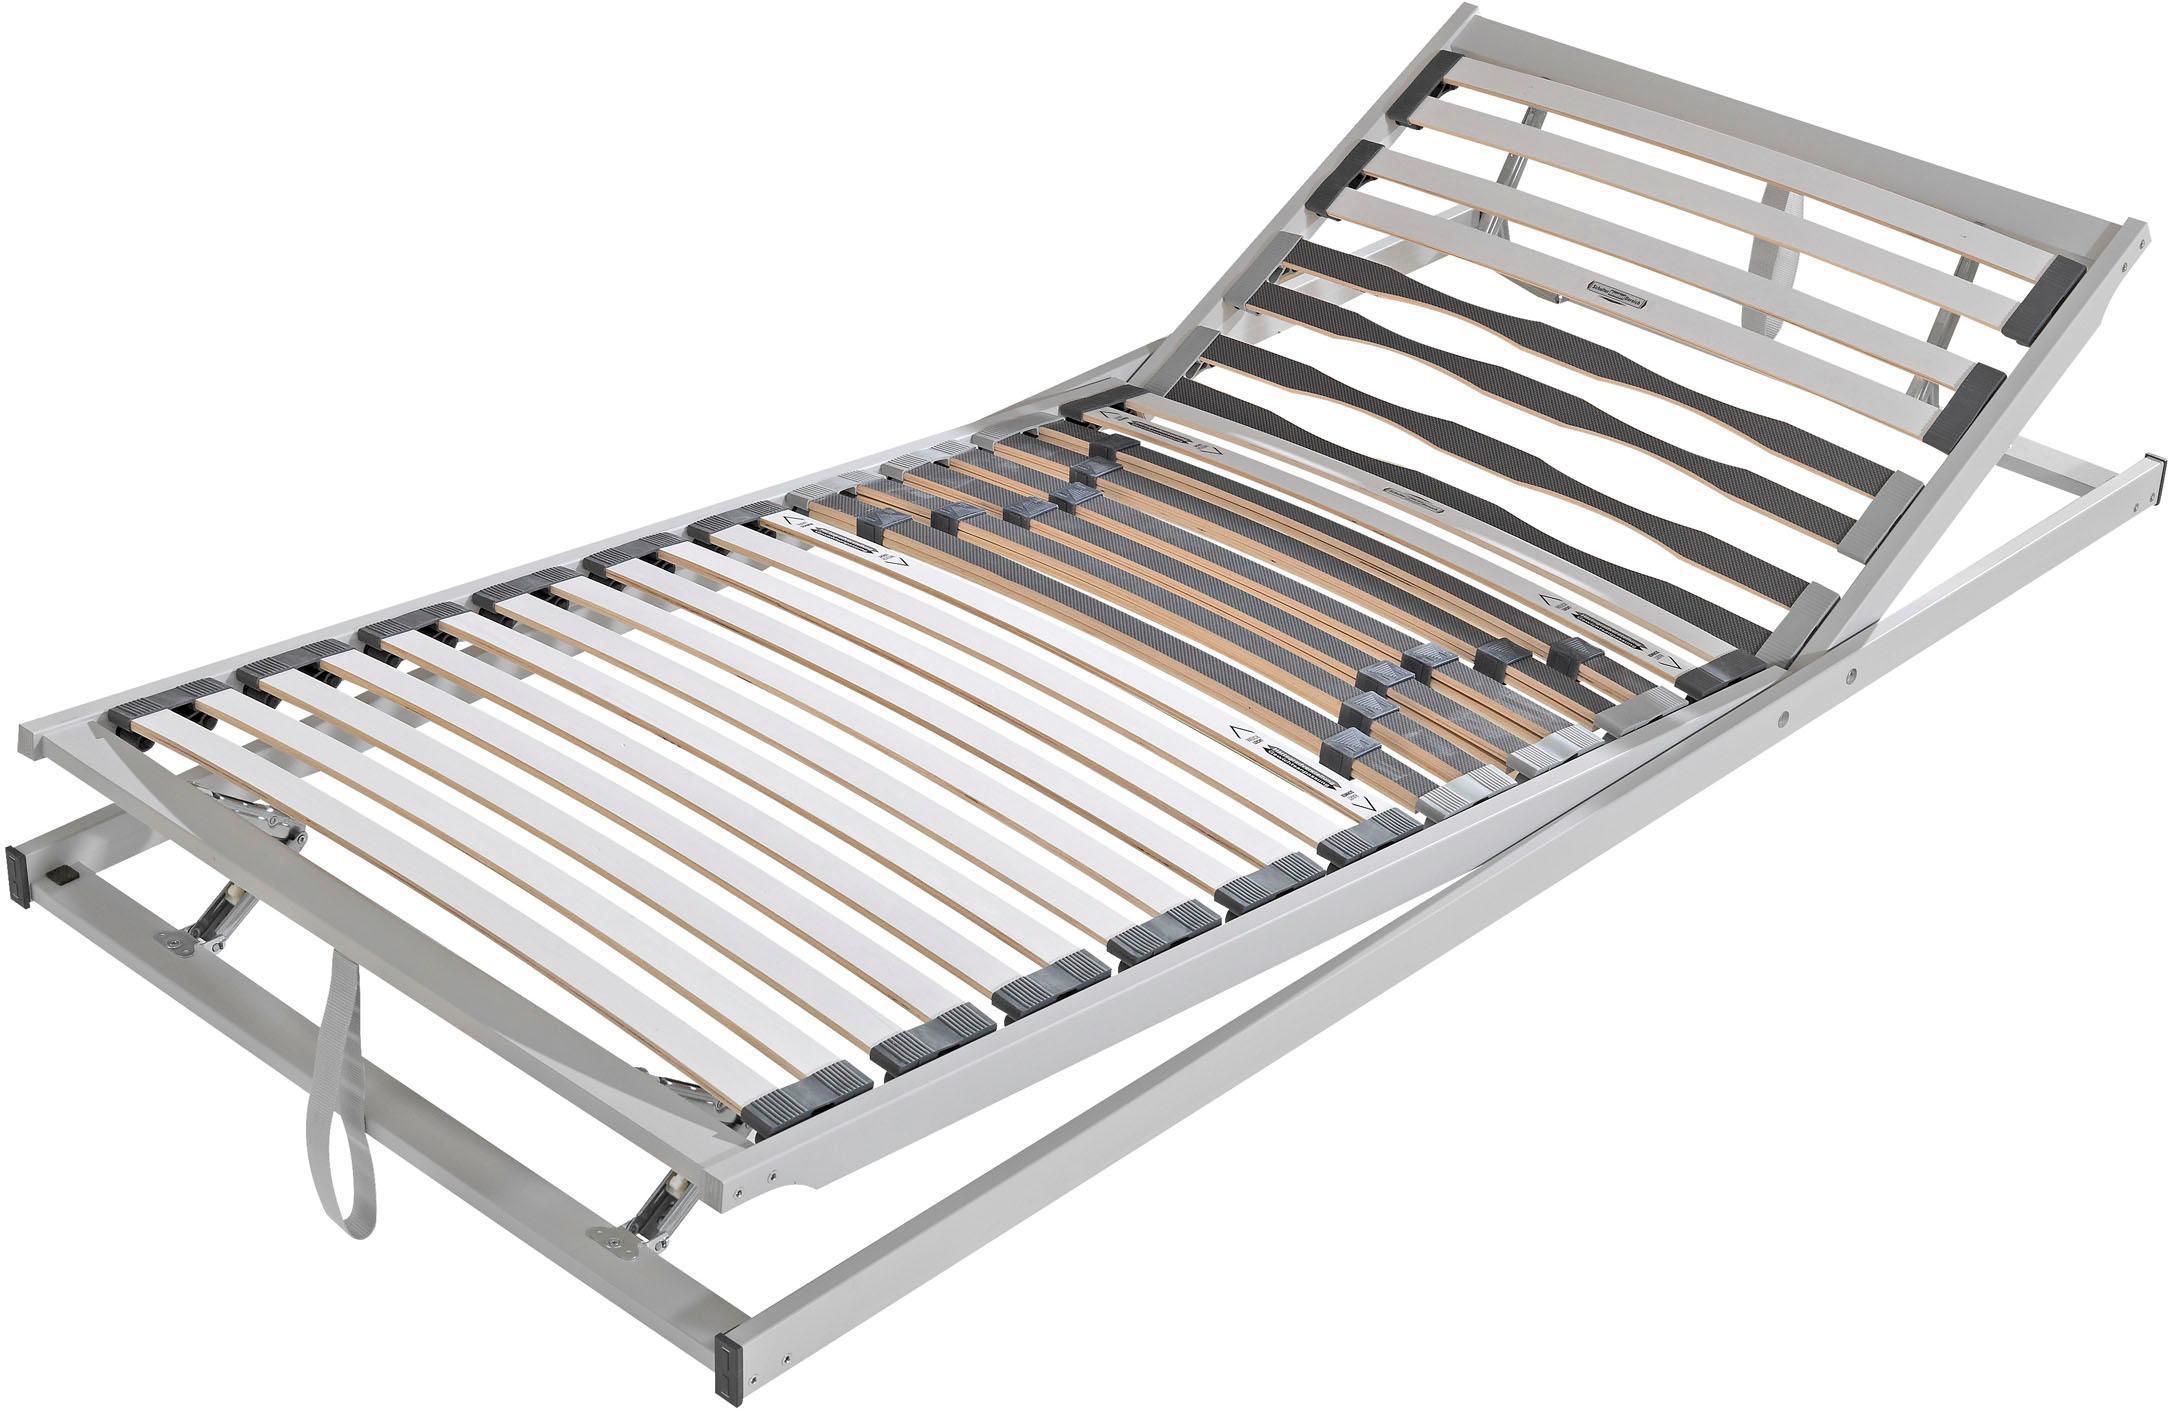 Lattenrost 3123 KF ADA trendline Kopfteil manuell verstellbar   Schlafzimmer > Lattenroste > Verstellbare Lattenroste   Ada Trendline